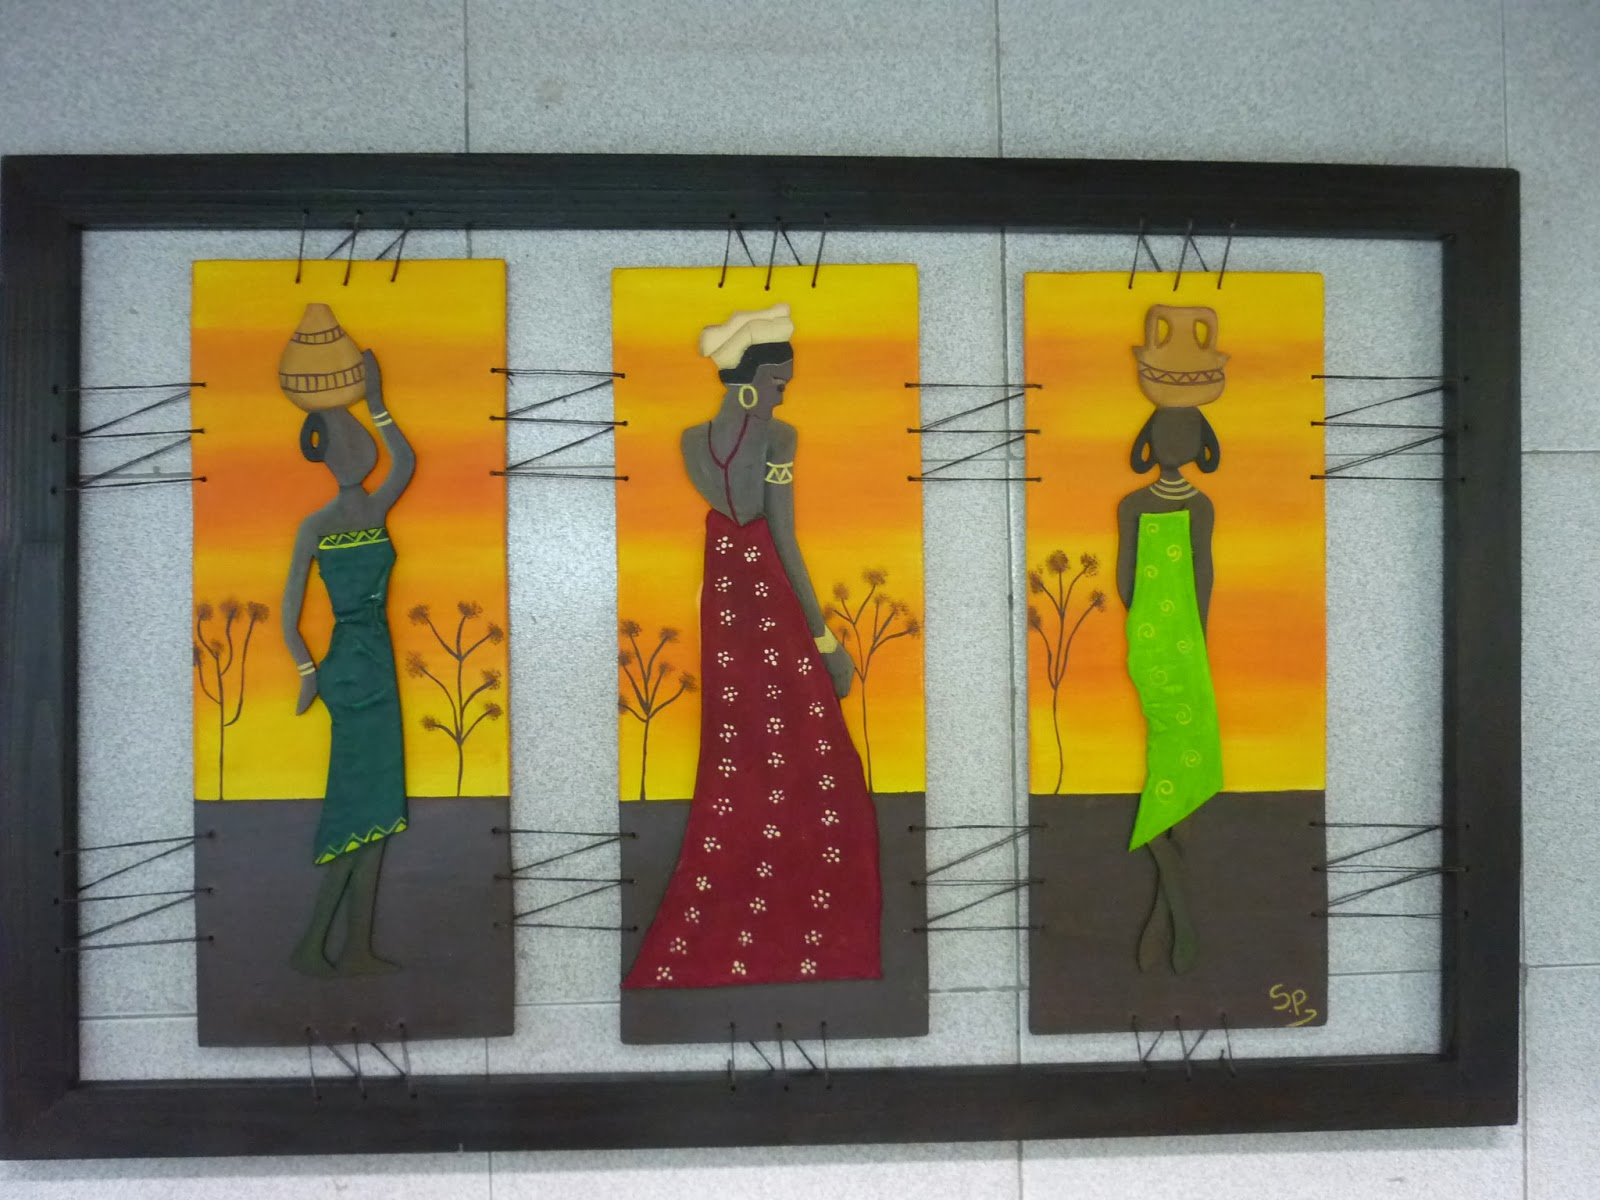 triptico de africanas realizadas con tela endurecida sobre un fondo pintado al acrilico de un paisaje las tres maderas atadas a un marco chato con rafia